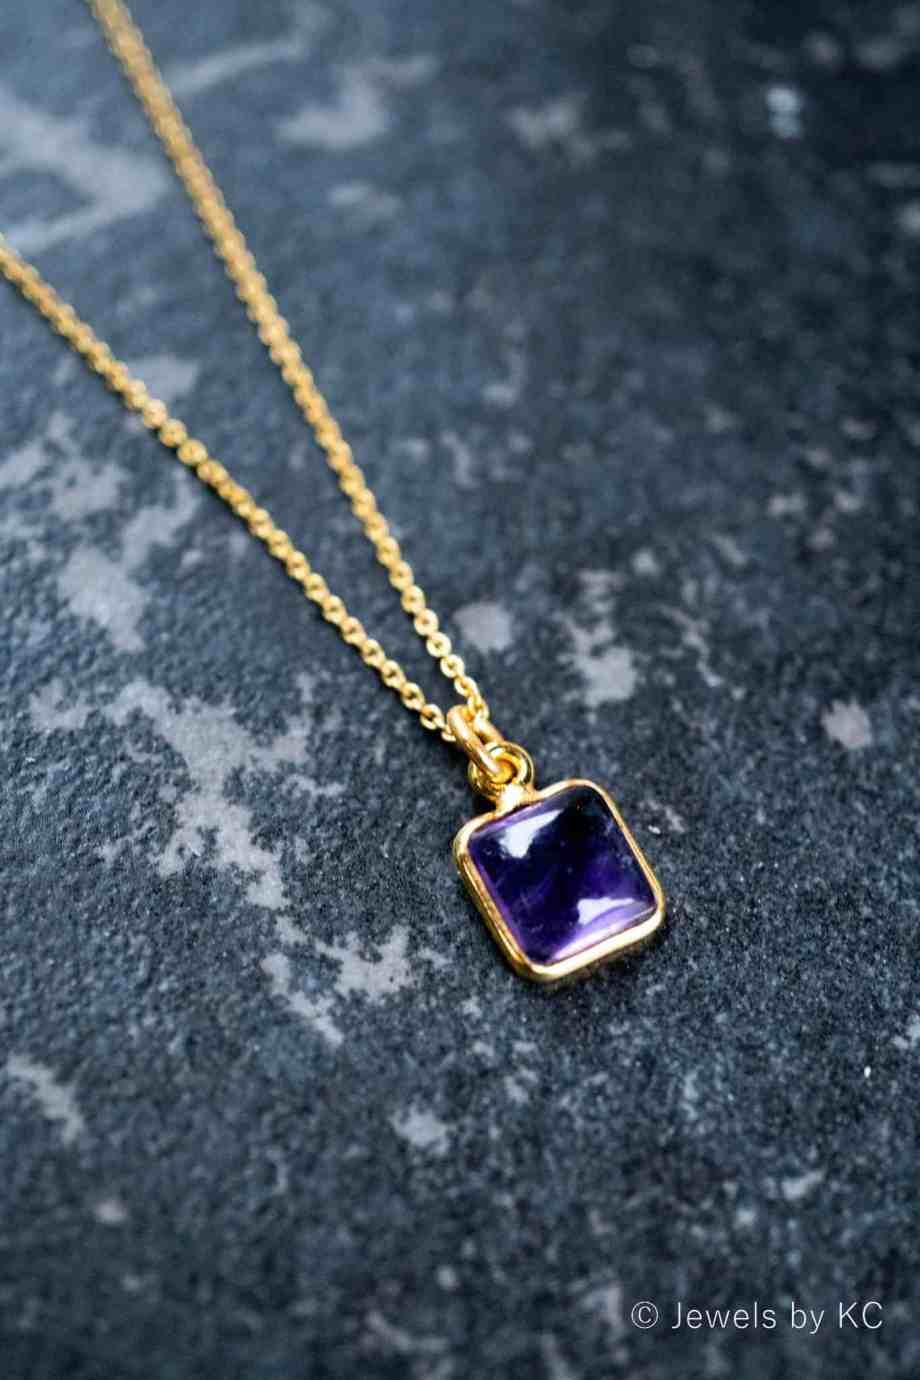 Gouden edelsteen ketting 'Square' paarse Amethist van Goud op Zilver